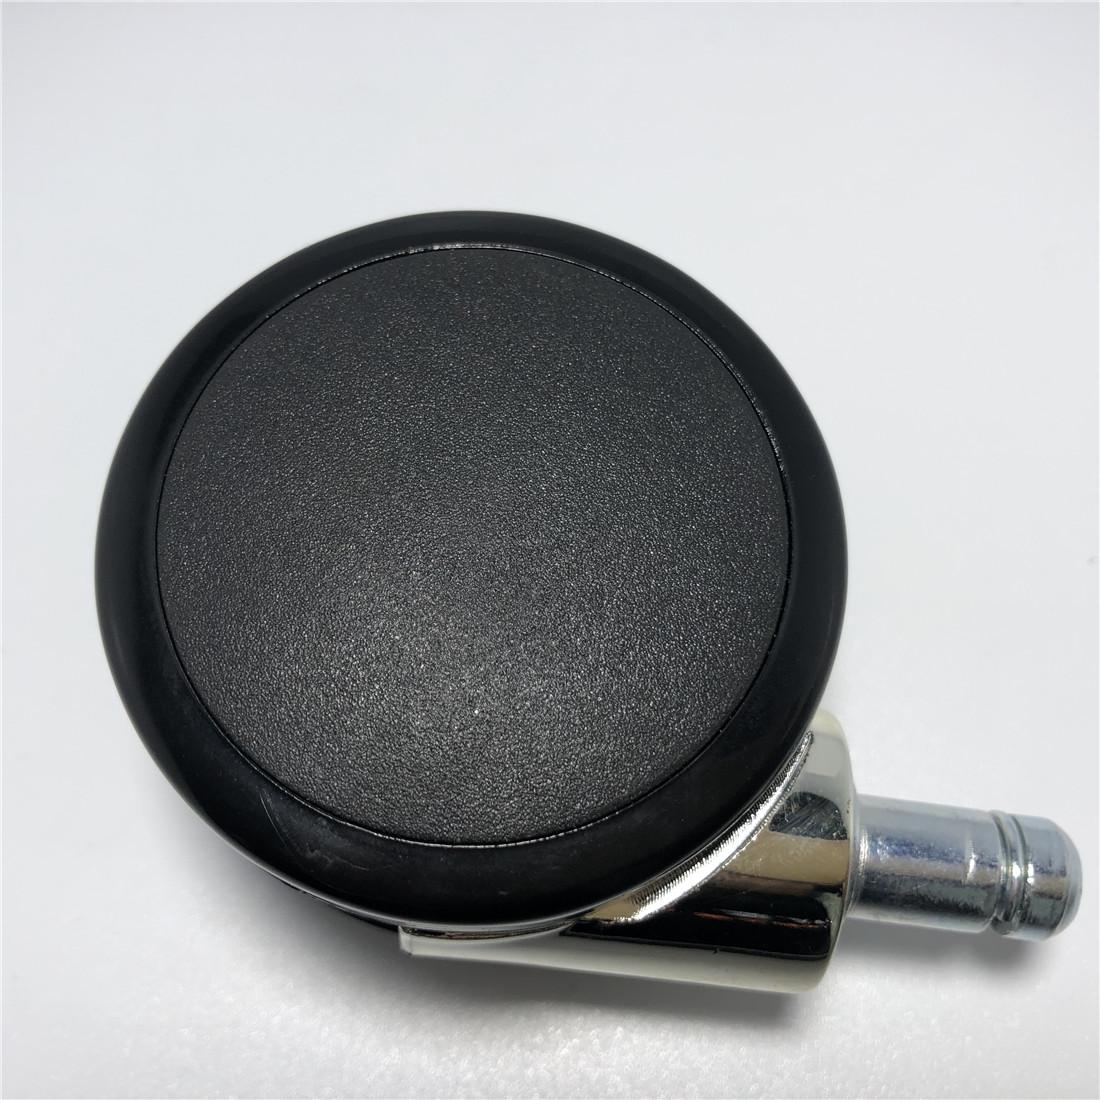 sgs certified oem products 60mm castor wheels fittings